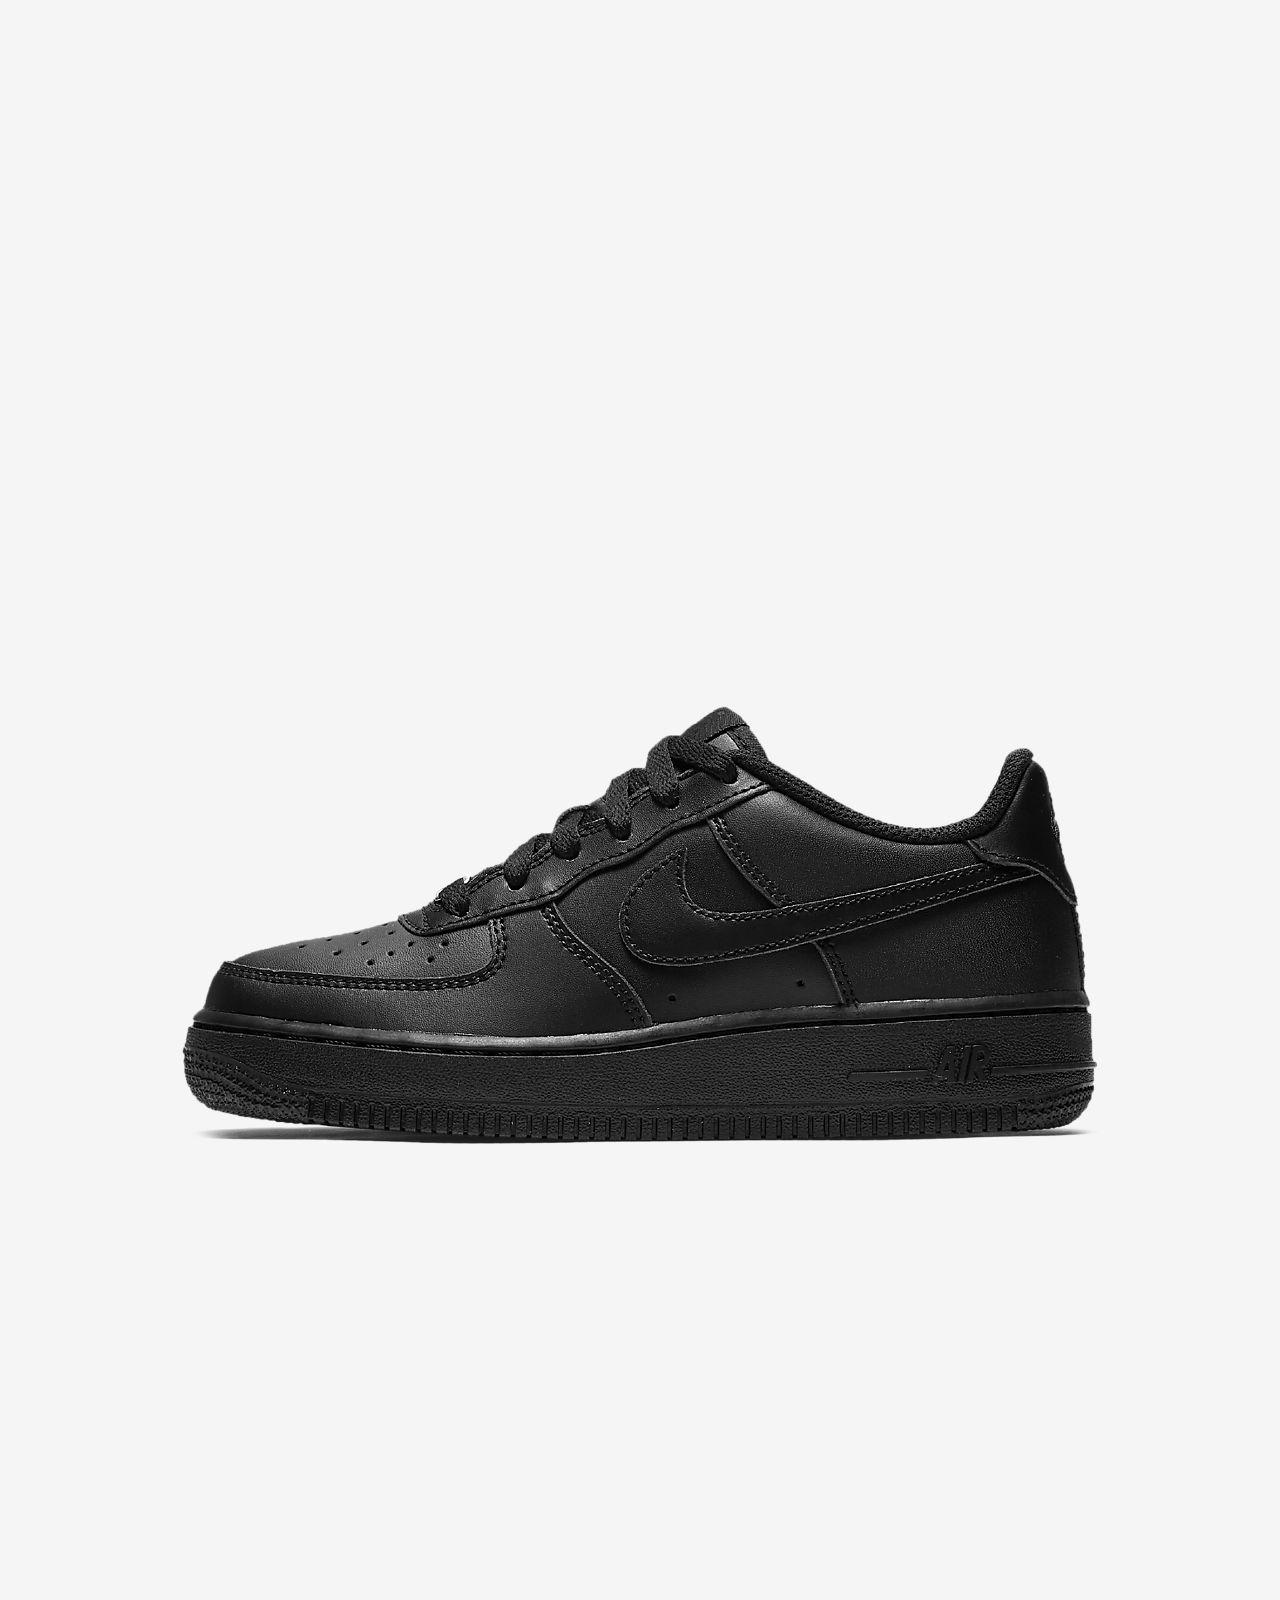 well known a few days away clearance sale Chaussure Nike Air Force 1 Triple Black pour Enfant plus âgé